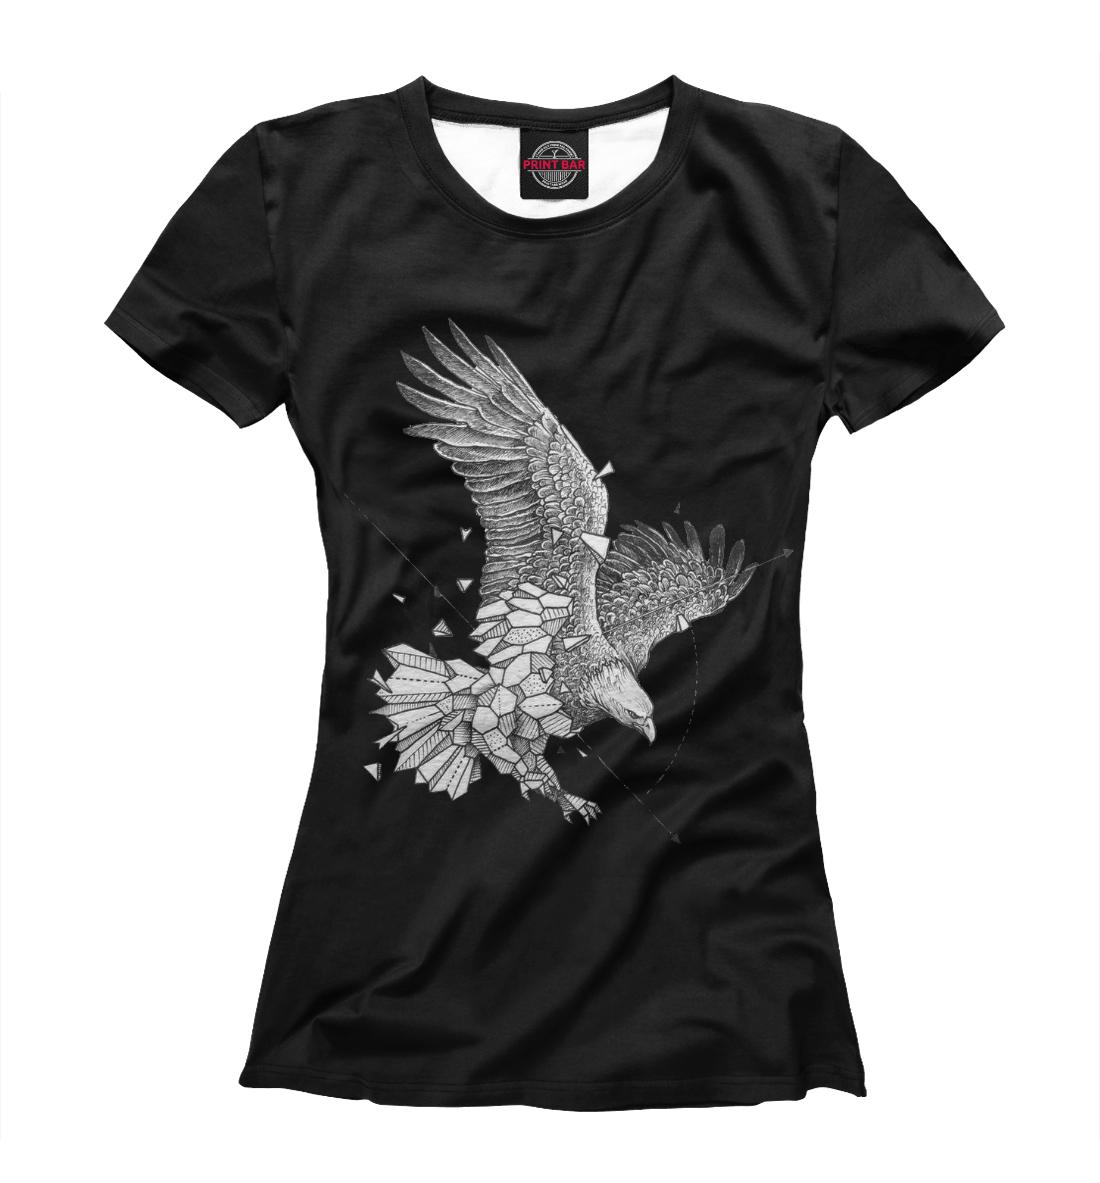 Купить Geometric dark eagle, Printbar, Футболки, HIP-658767-fut-1